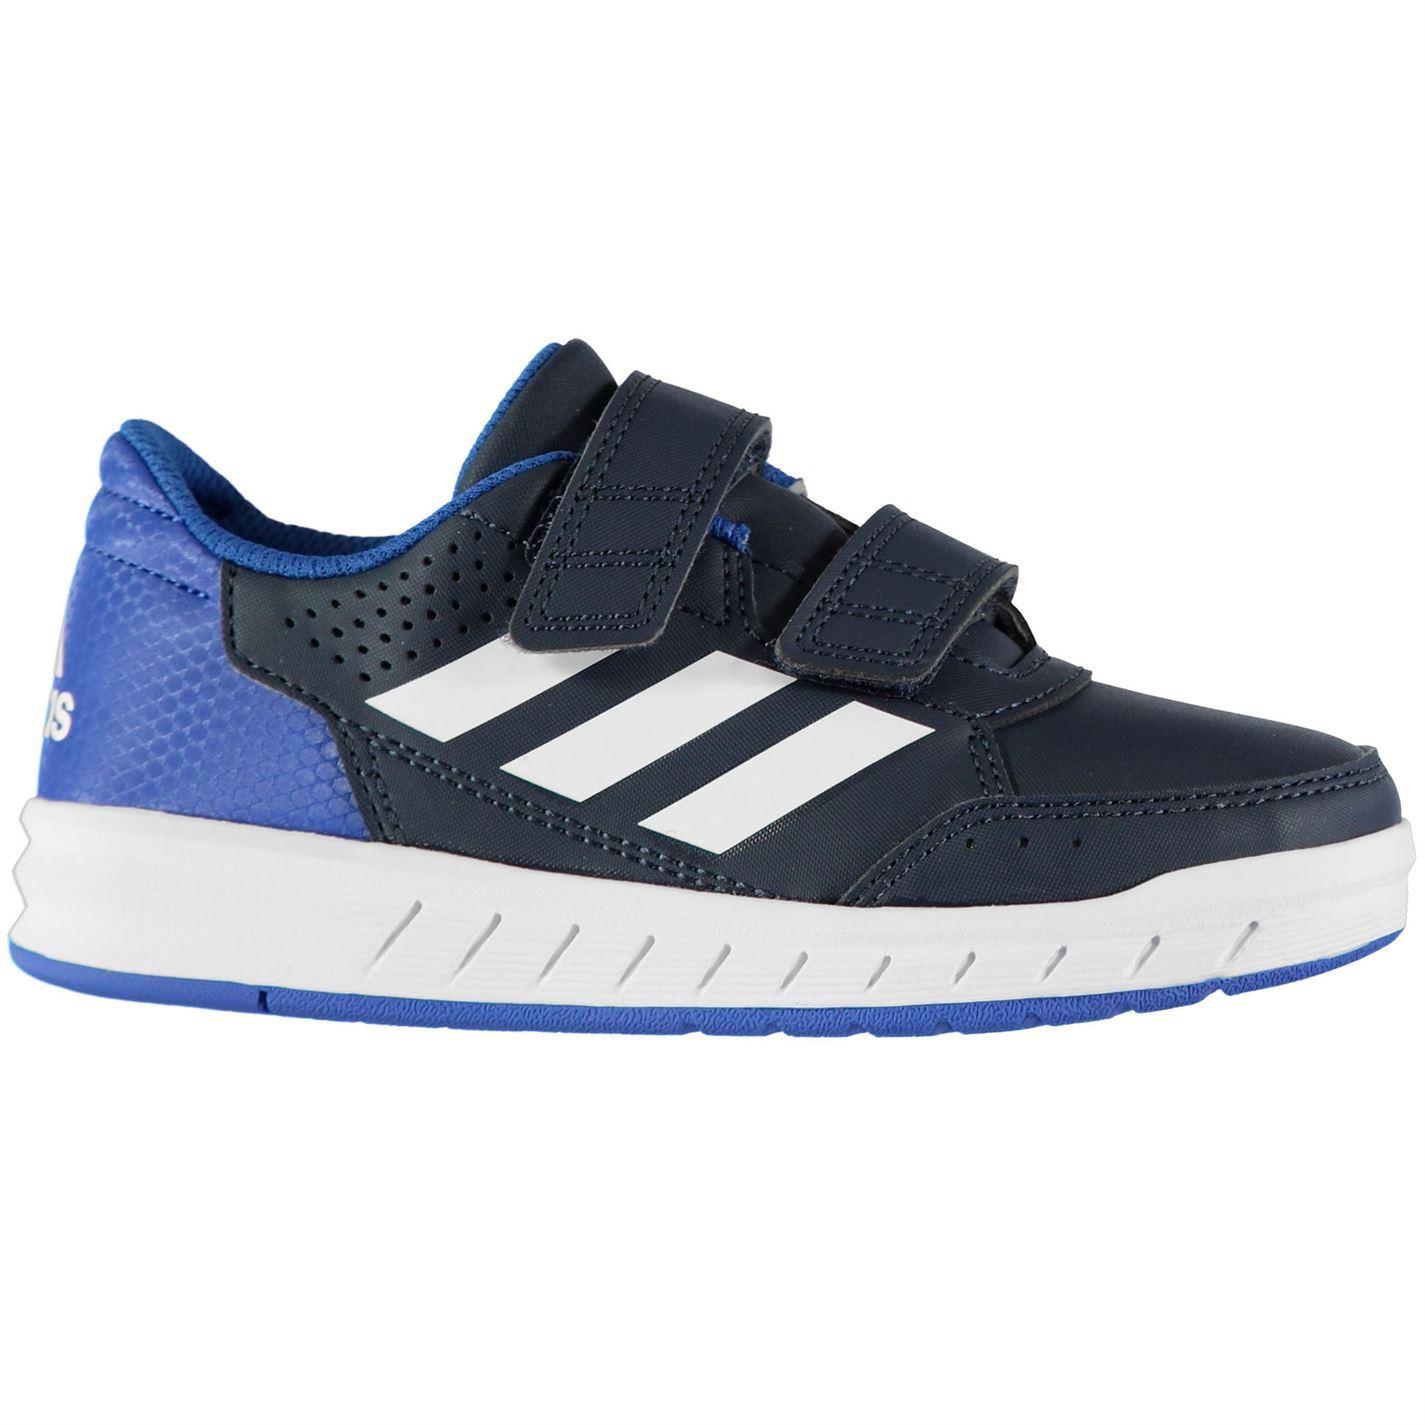 miniatura 10 - ADIDAS-alta-Sport-CF-Scarpe-da-ginnastica-bambino-ragazzo-calzature